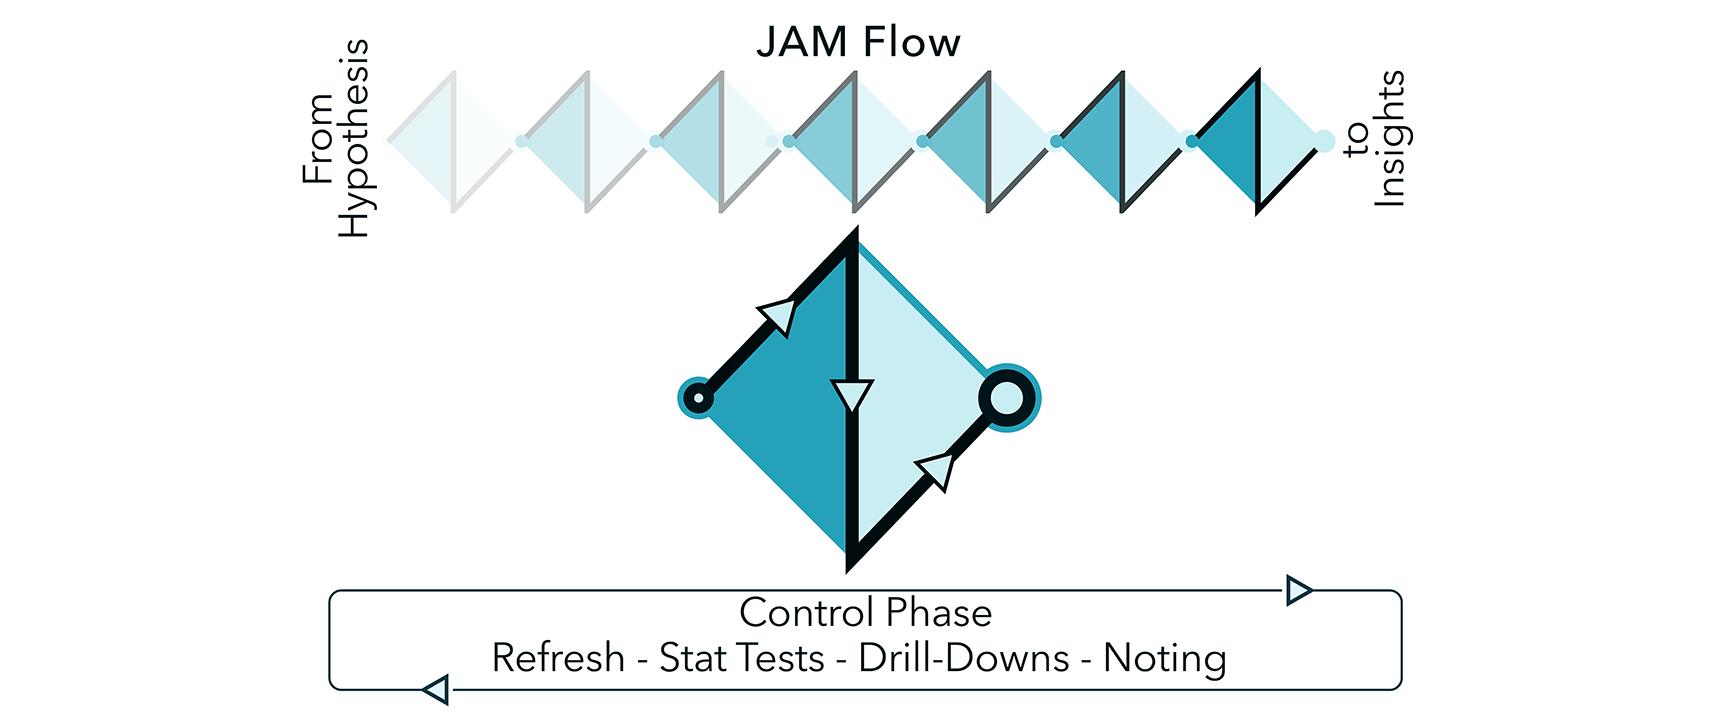 JAM Flow